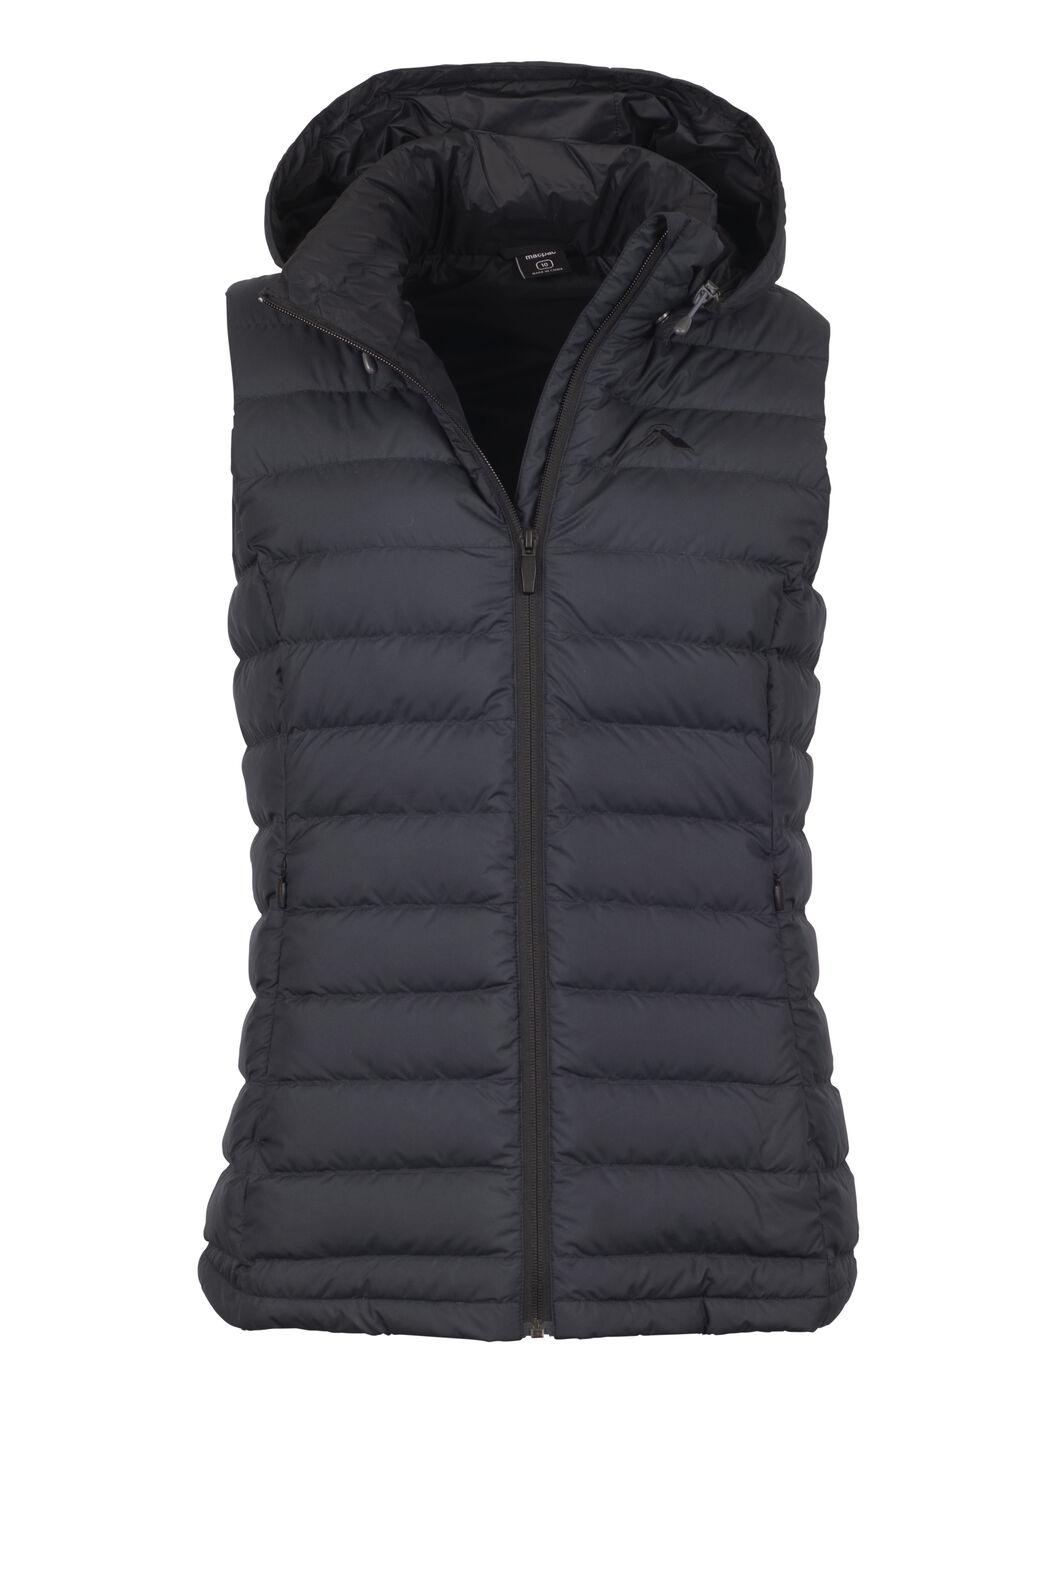 Macpac Zodiac Hooded Down Vest - Women's, Black, hi-res